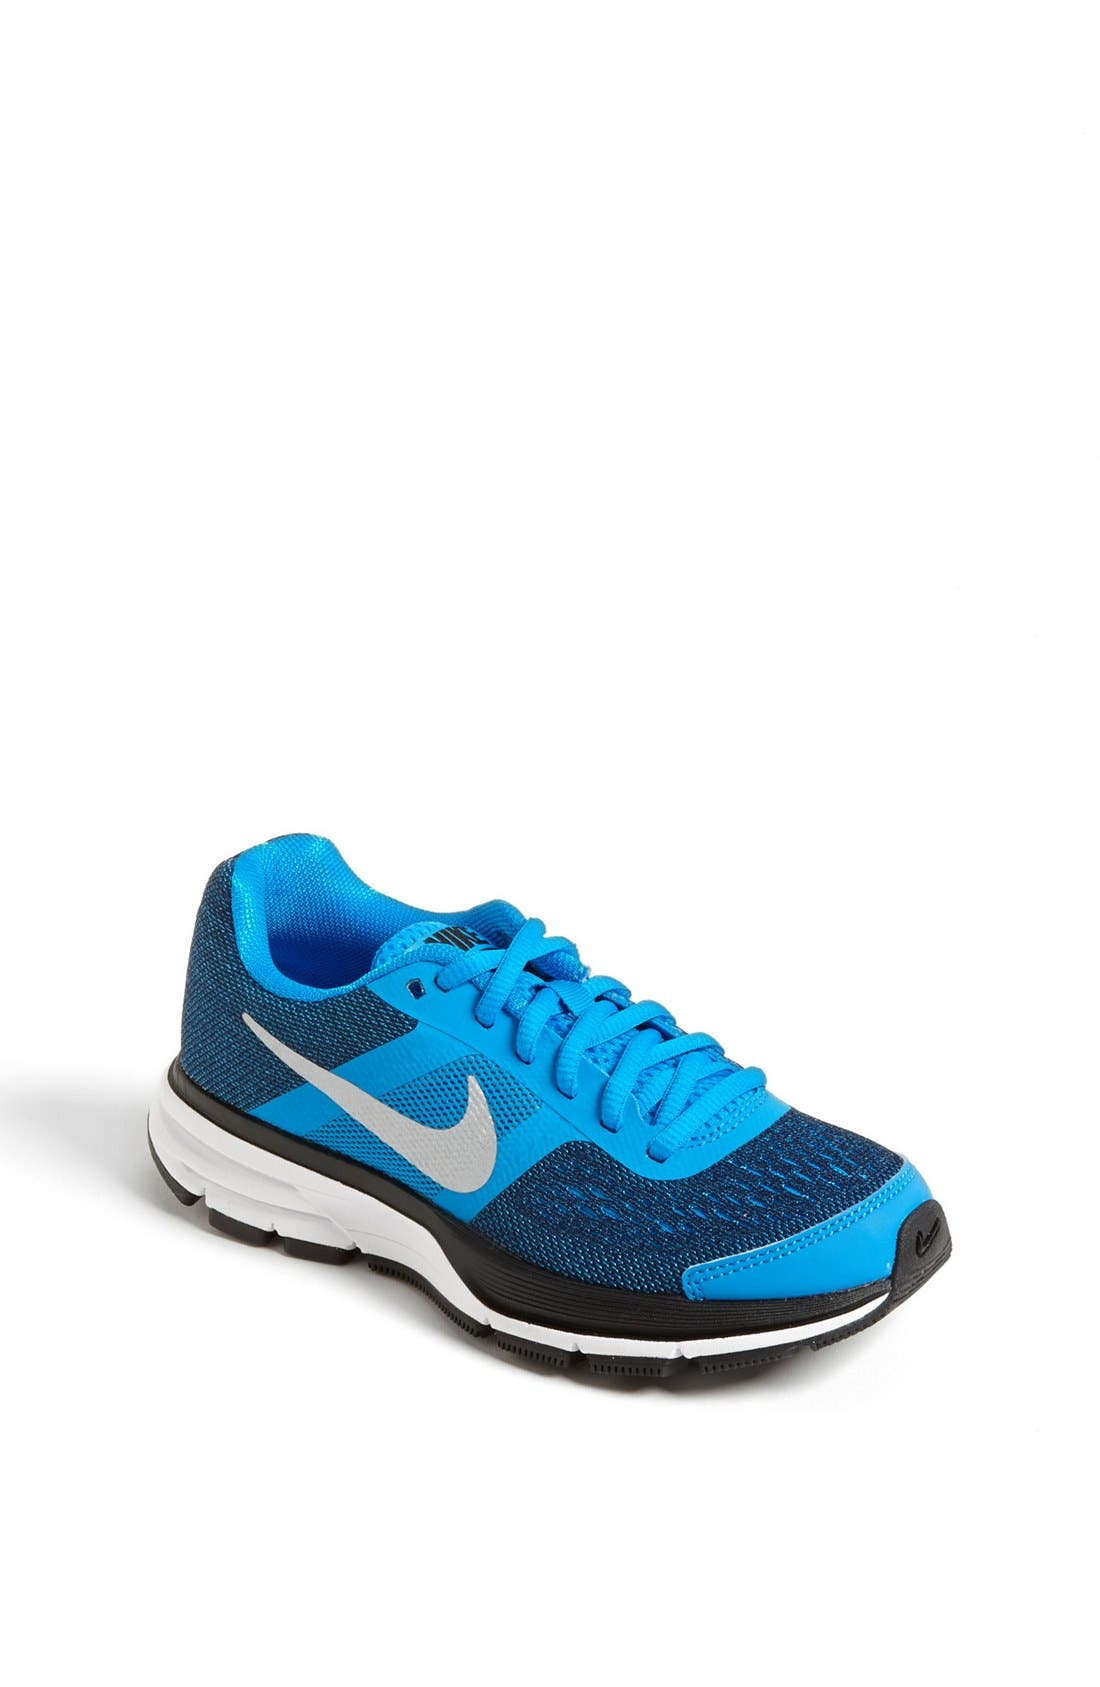 Alternate Image 1 Selected - Nike 'Air Pegasus+ 30 GS' Running Shoe (Little Kid & Big Kid)